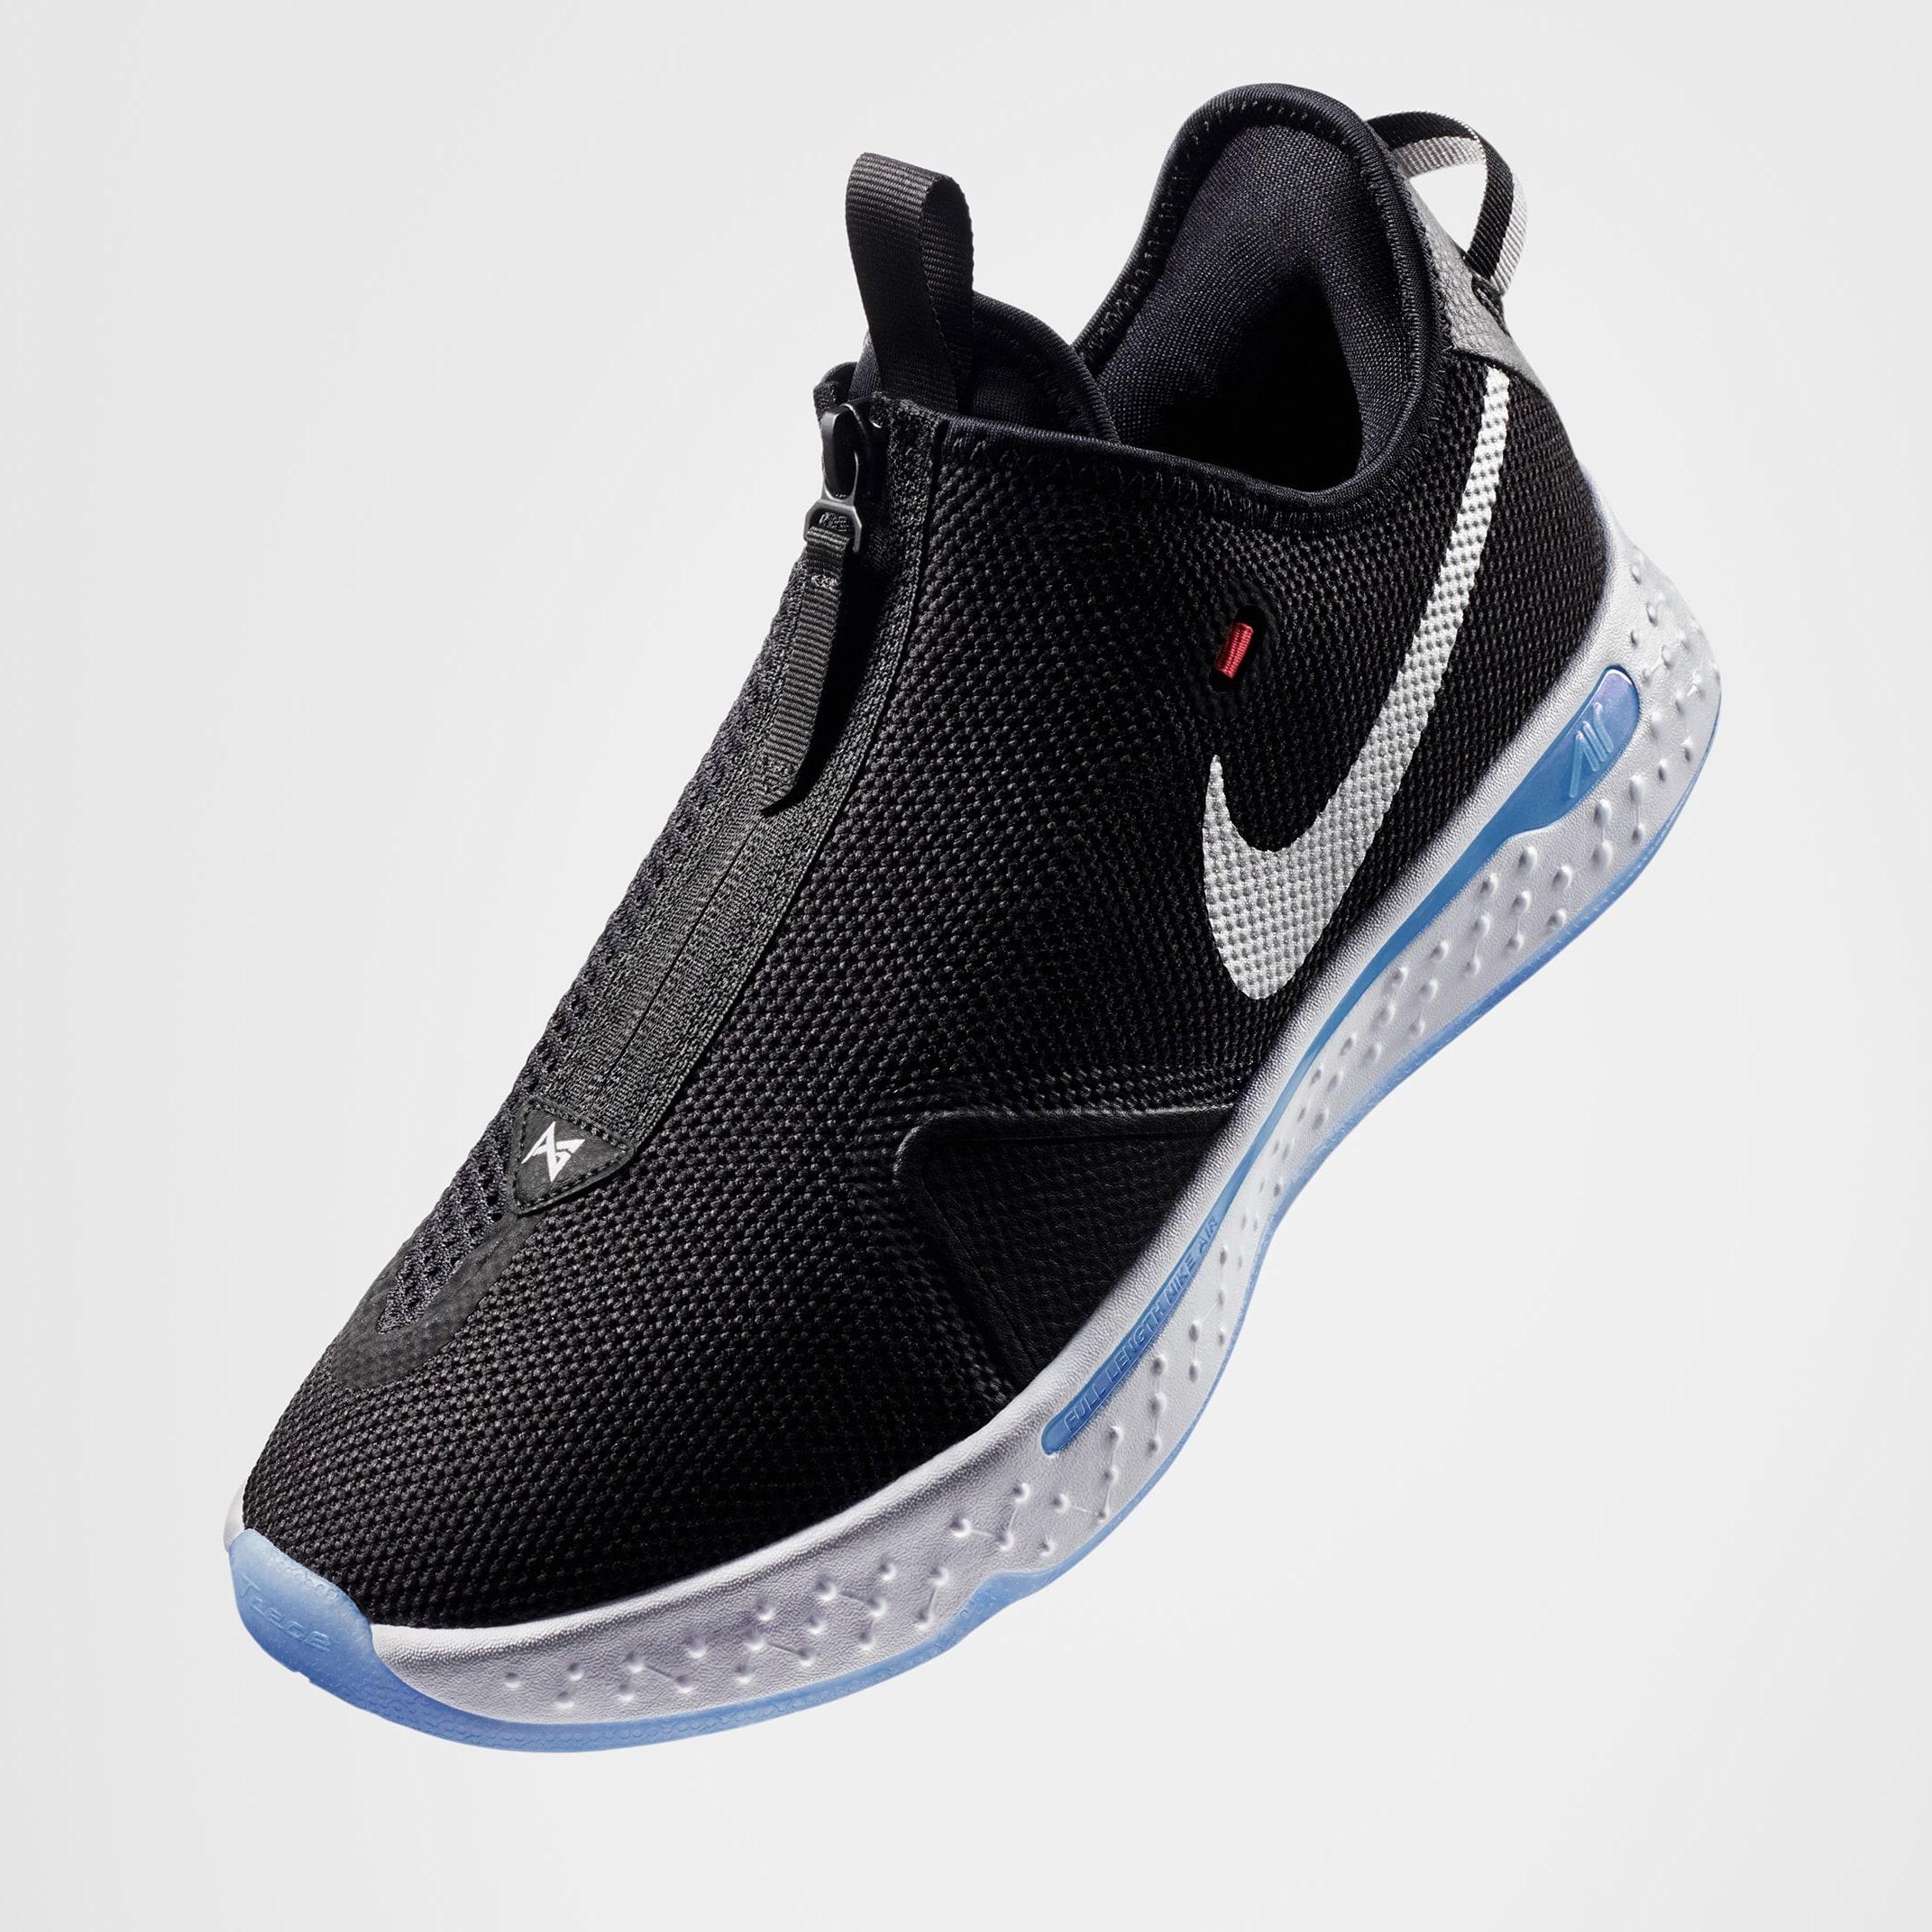 Paul george shoes 2020